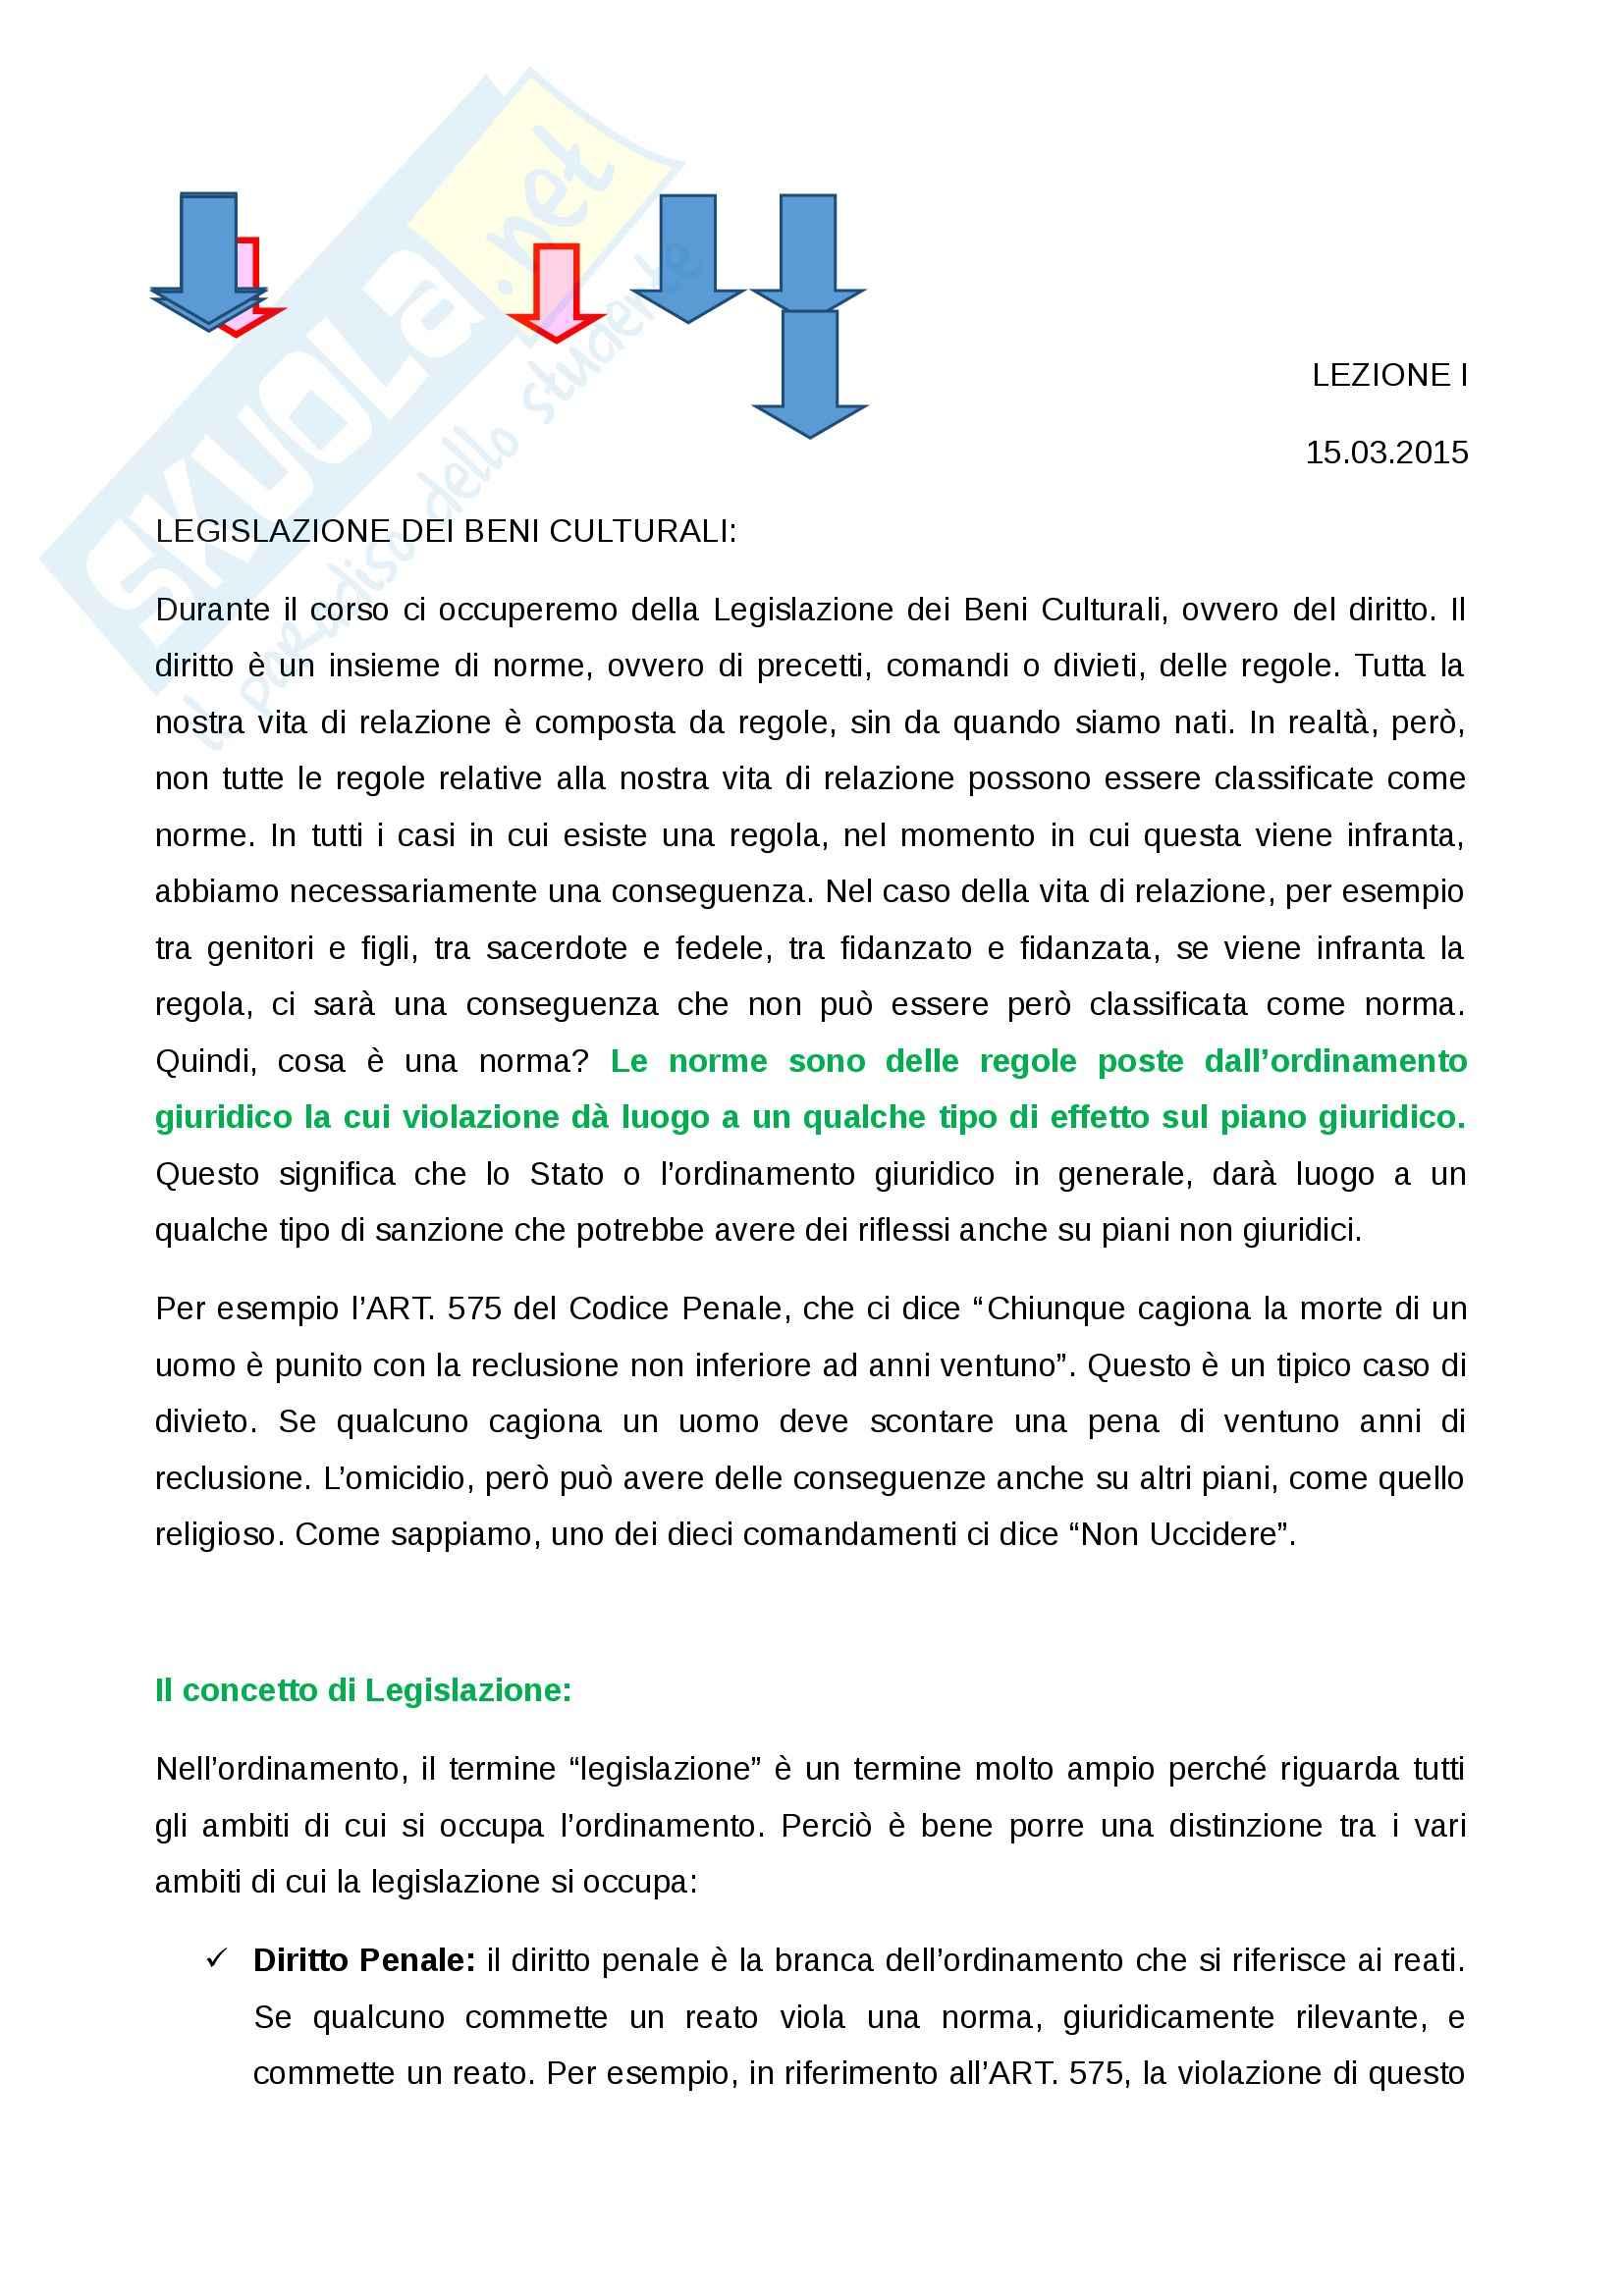 Appunti Lezioni A.A. 2014/2015 Legislazione dei Beni Culturali